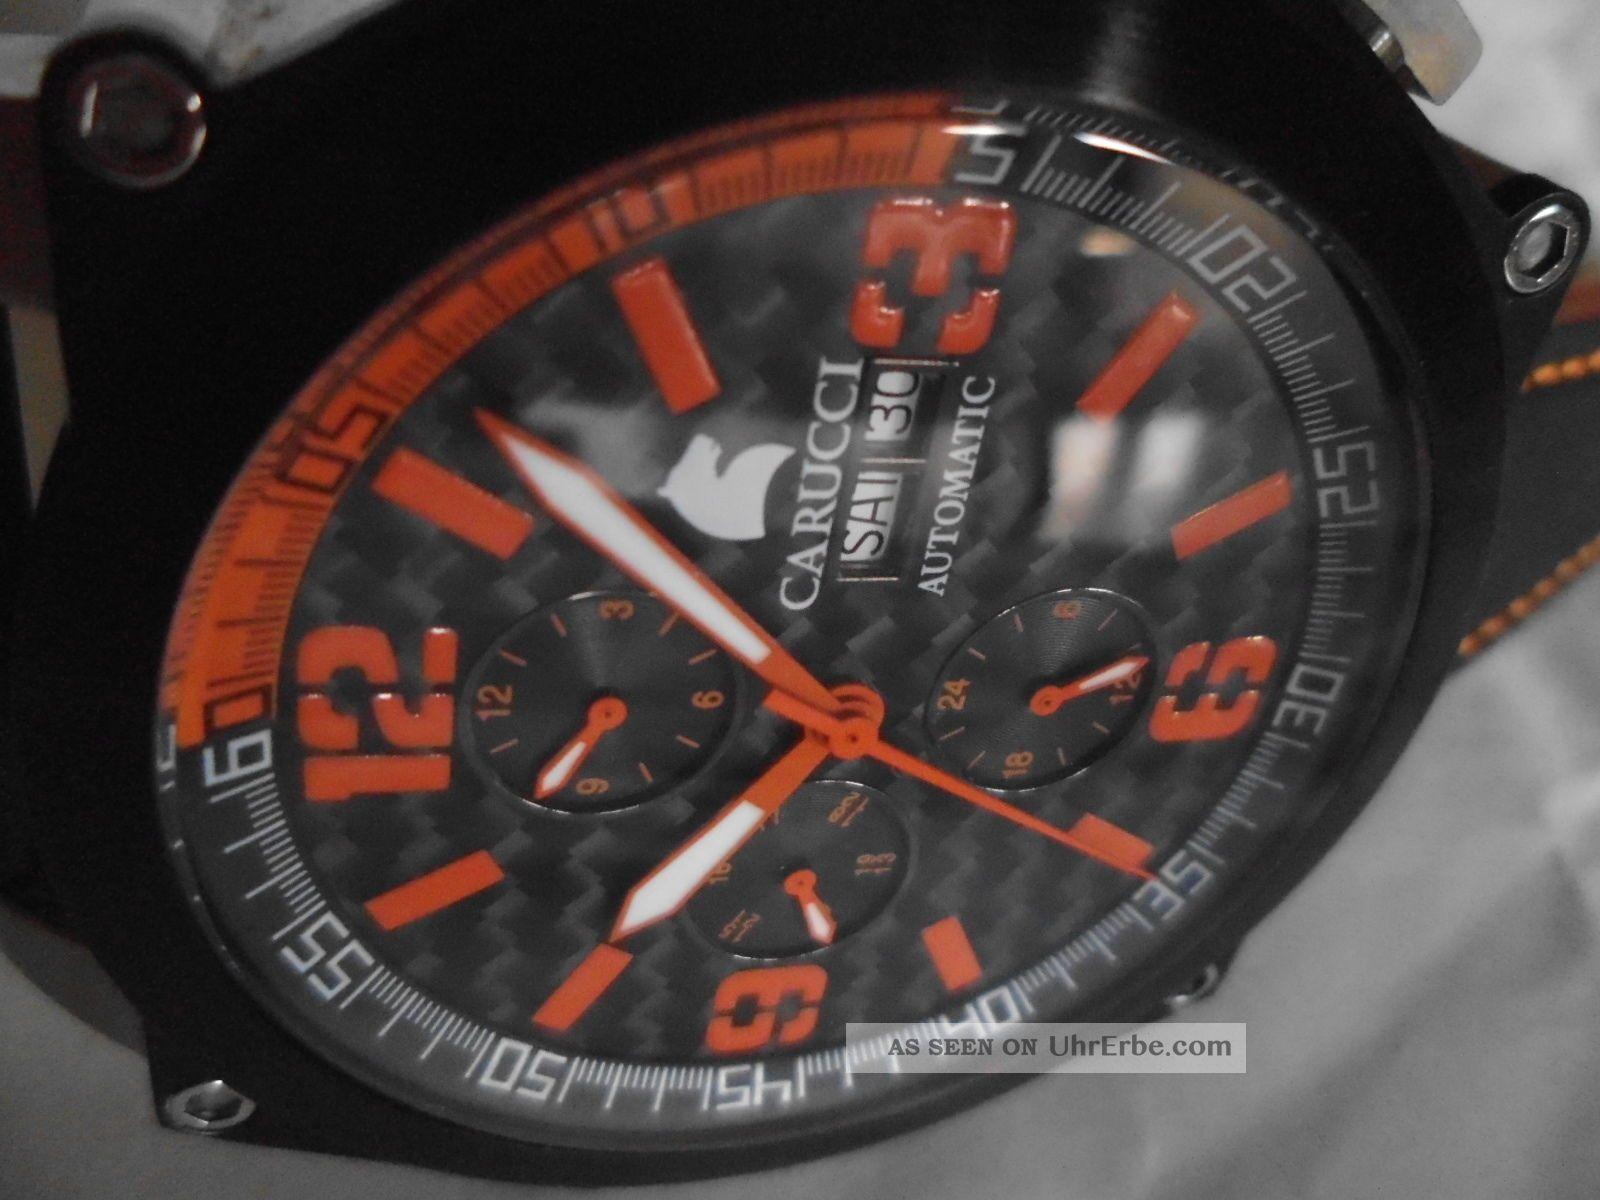 Autoamtik Flieger - Pilot - Carucci - Automatic (u - Boat Style) Neuwertig Armbanduhren Bild